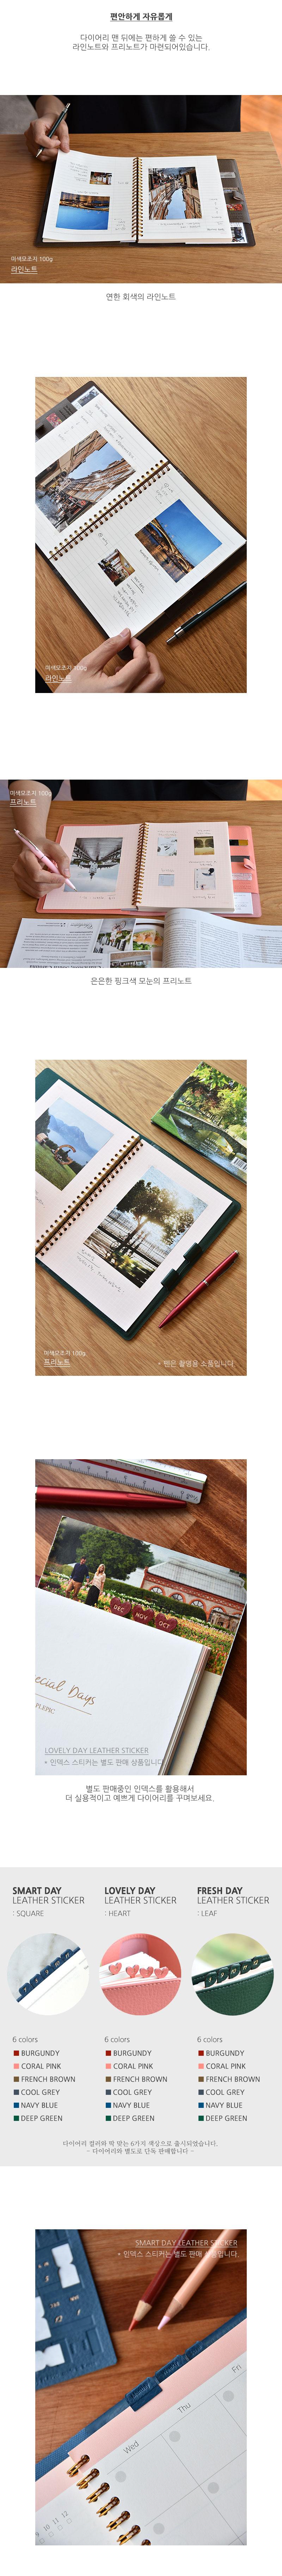 Spring Days Diary - 플레픽, 18,900원, 만년형, 심플/베이직